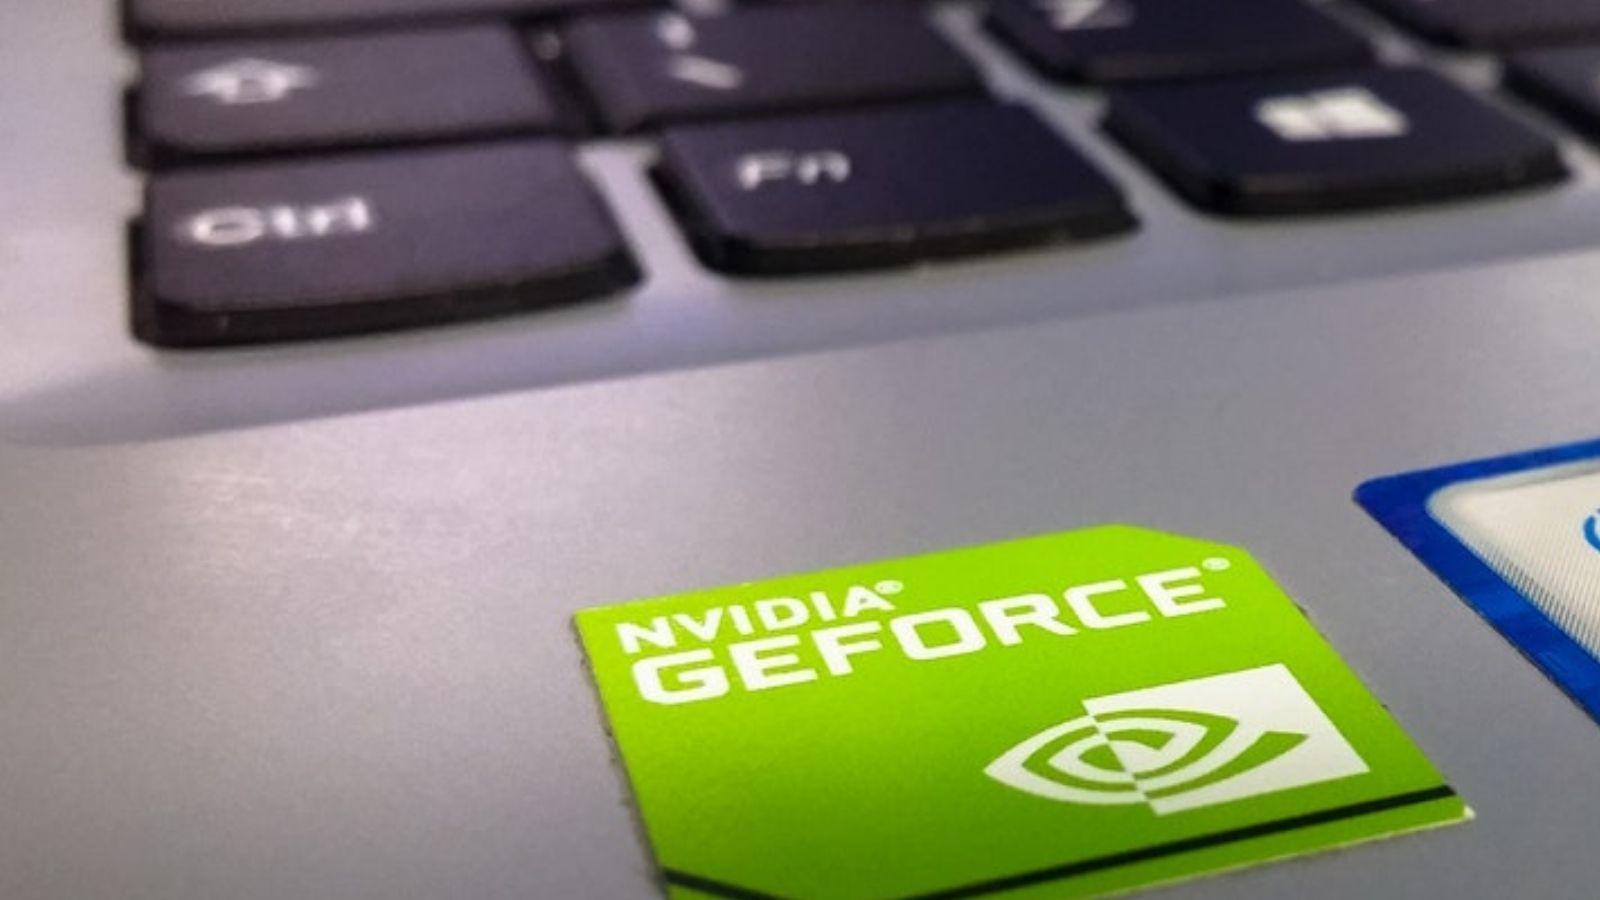 Nvidia GeForce Chip